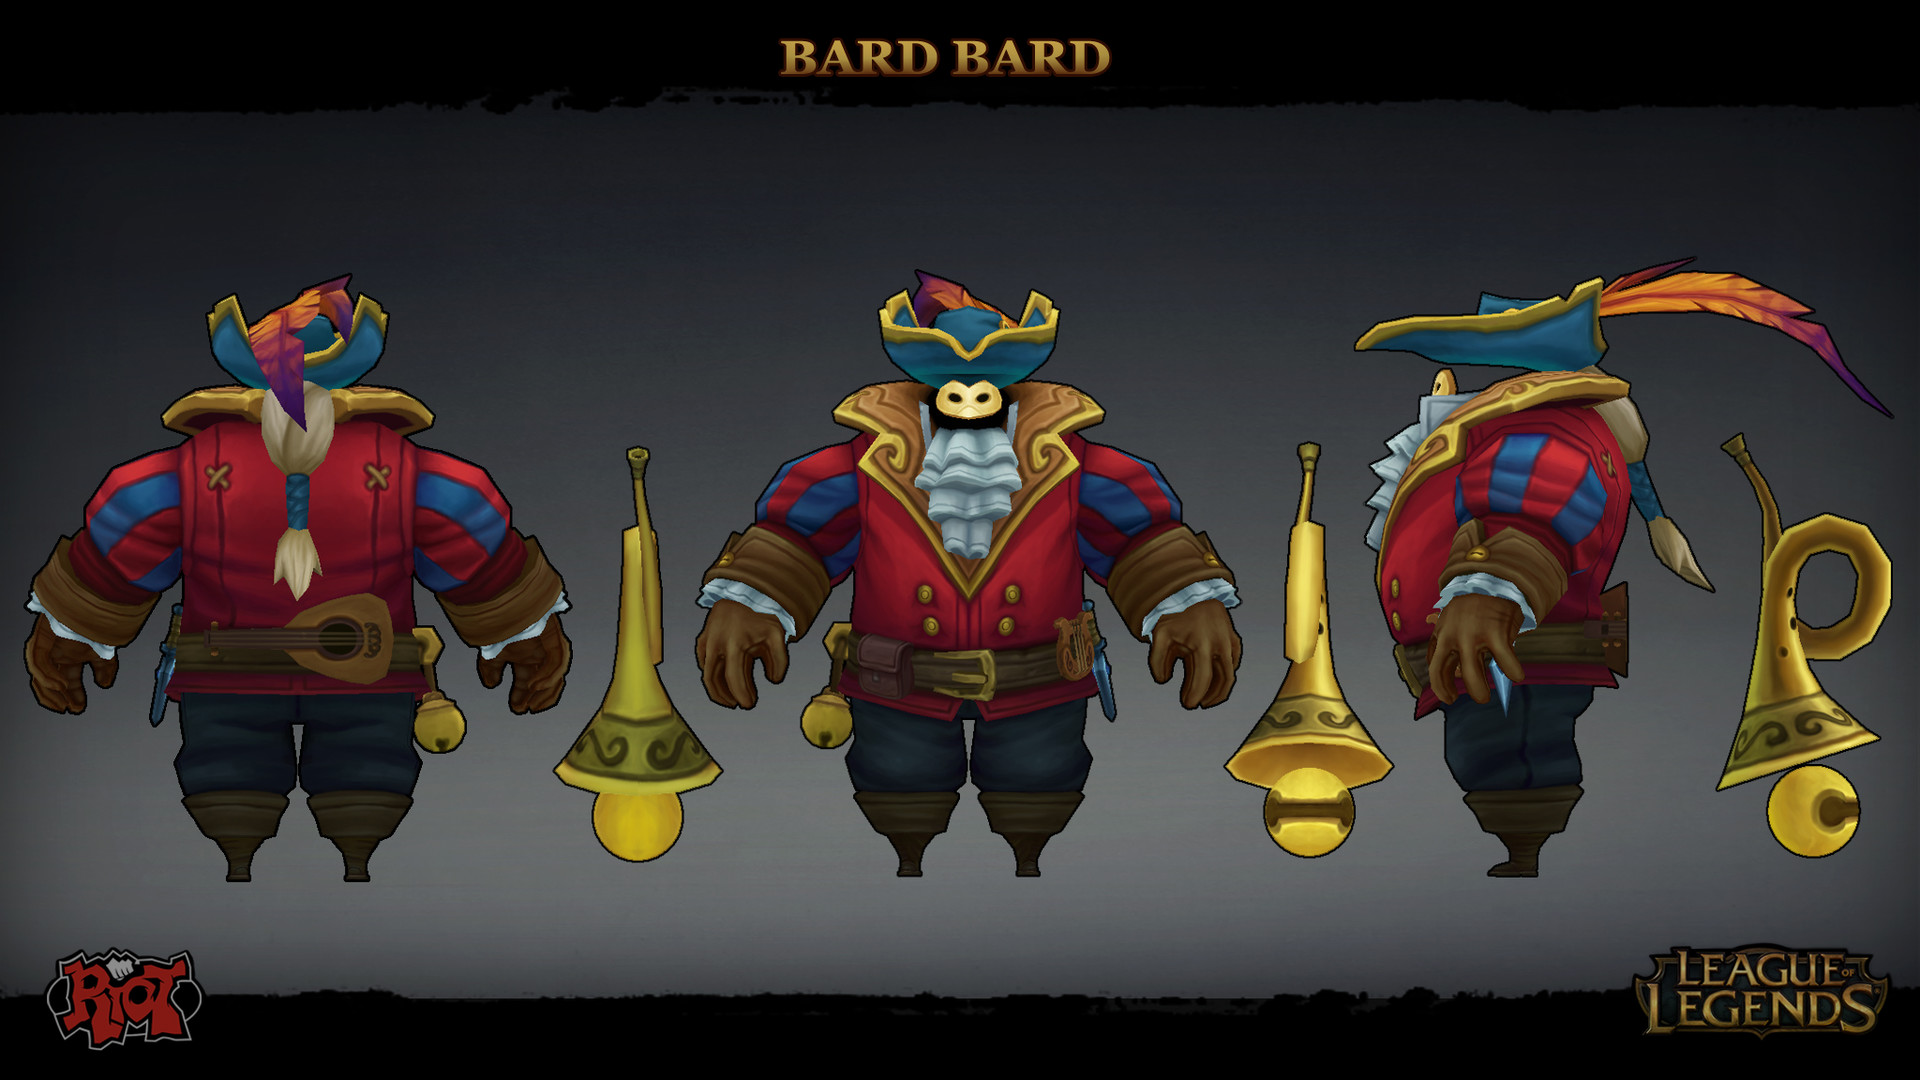 Bard Minimalistic League Of Legends Wallpapers League Of: Image - Bard Bard Model 01.jpg